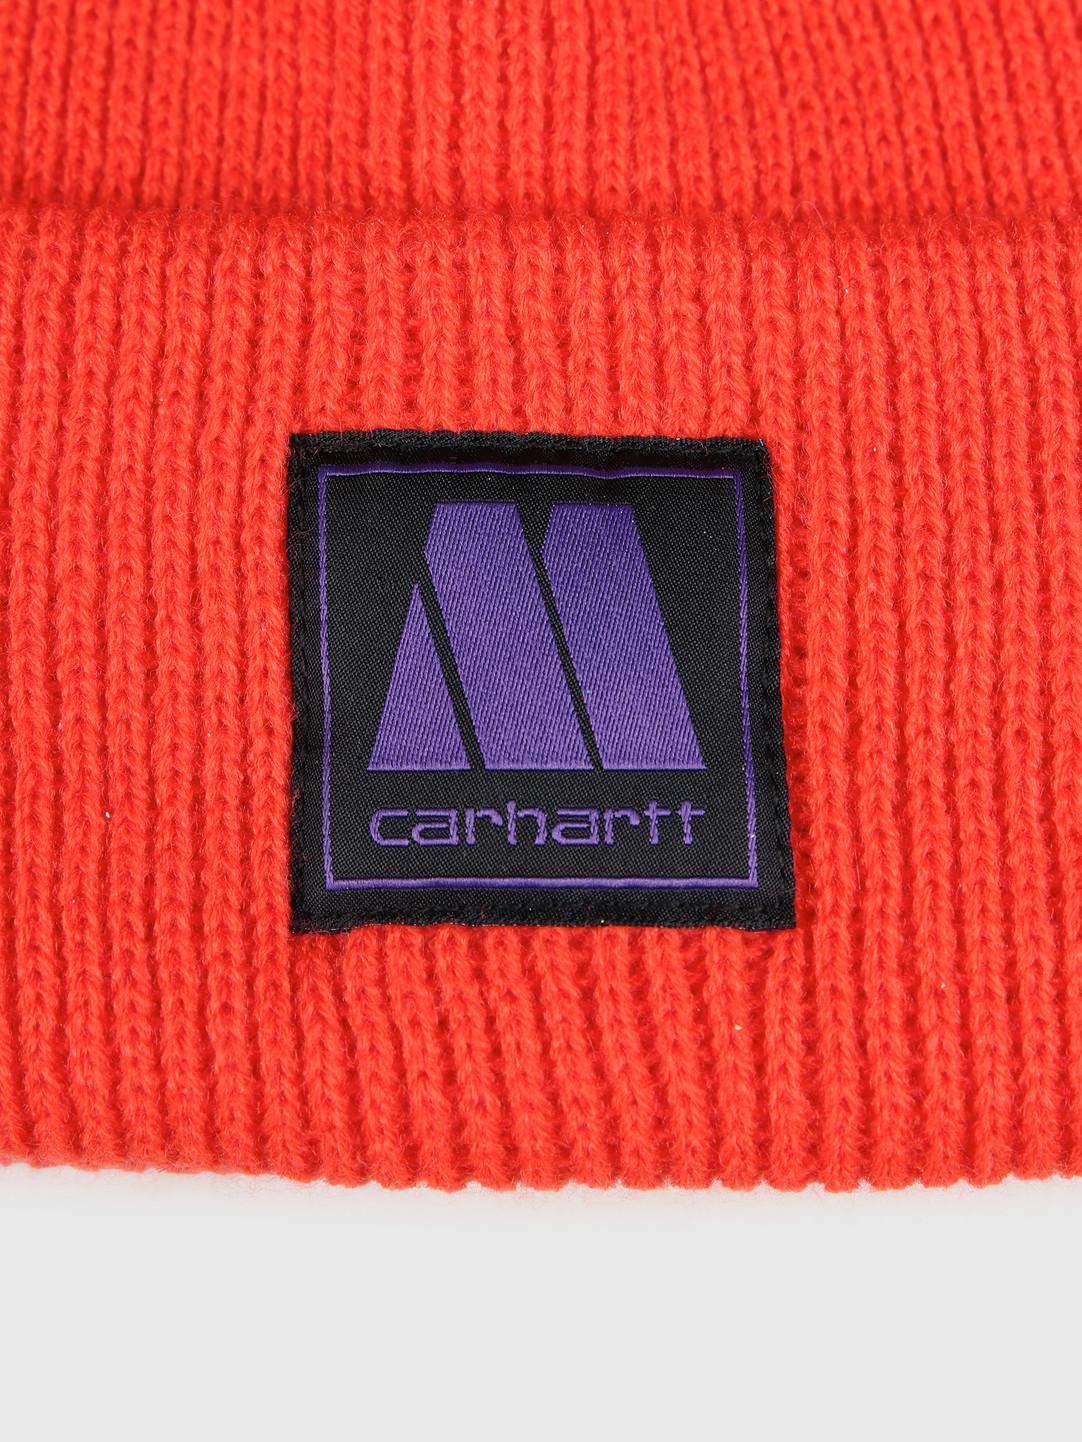 Carhartt WIP Carhartt WIP Motown Marvin Beanie Cherry Tomato I027849